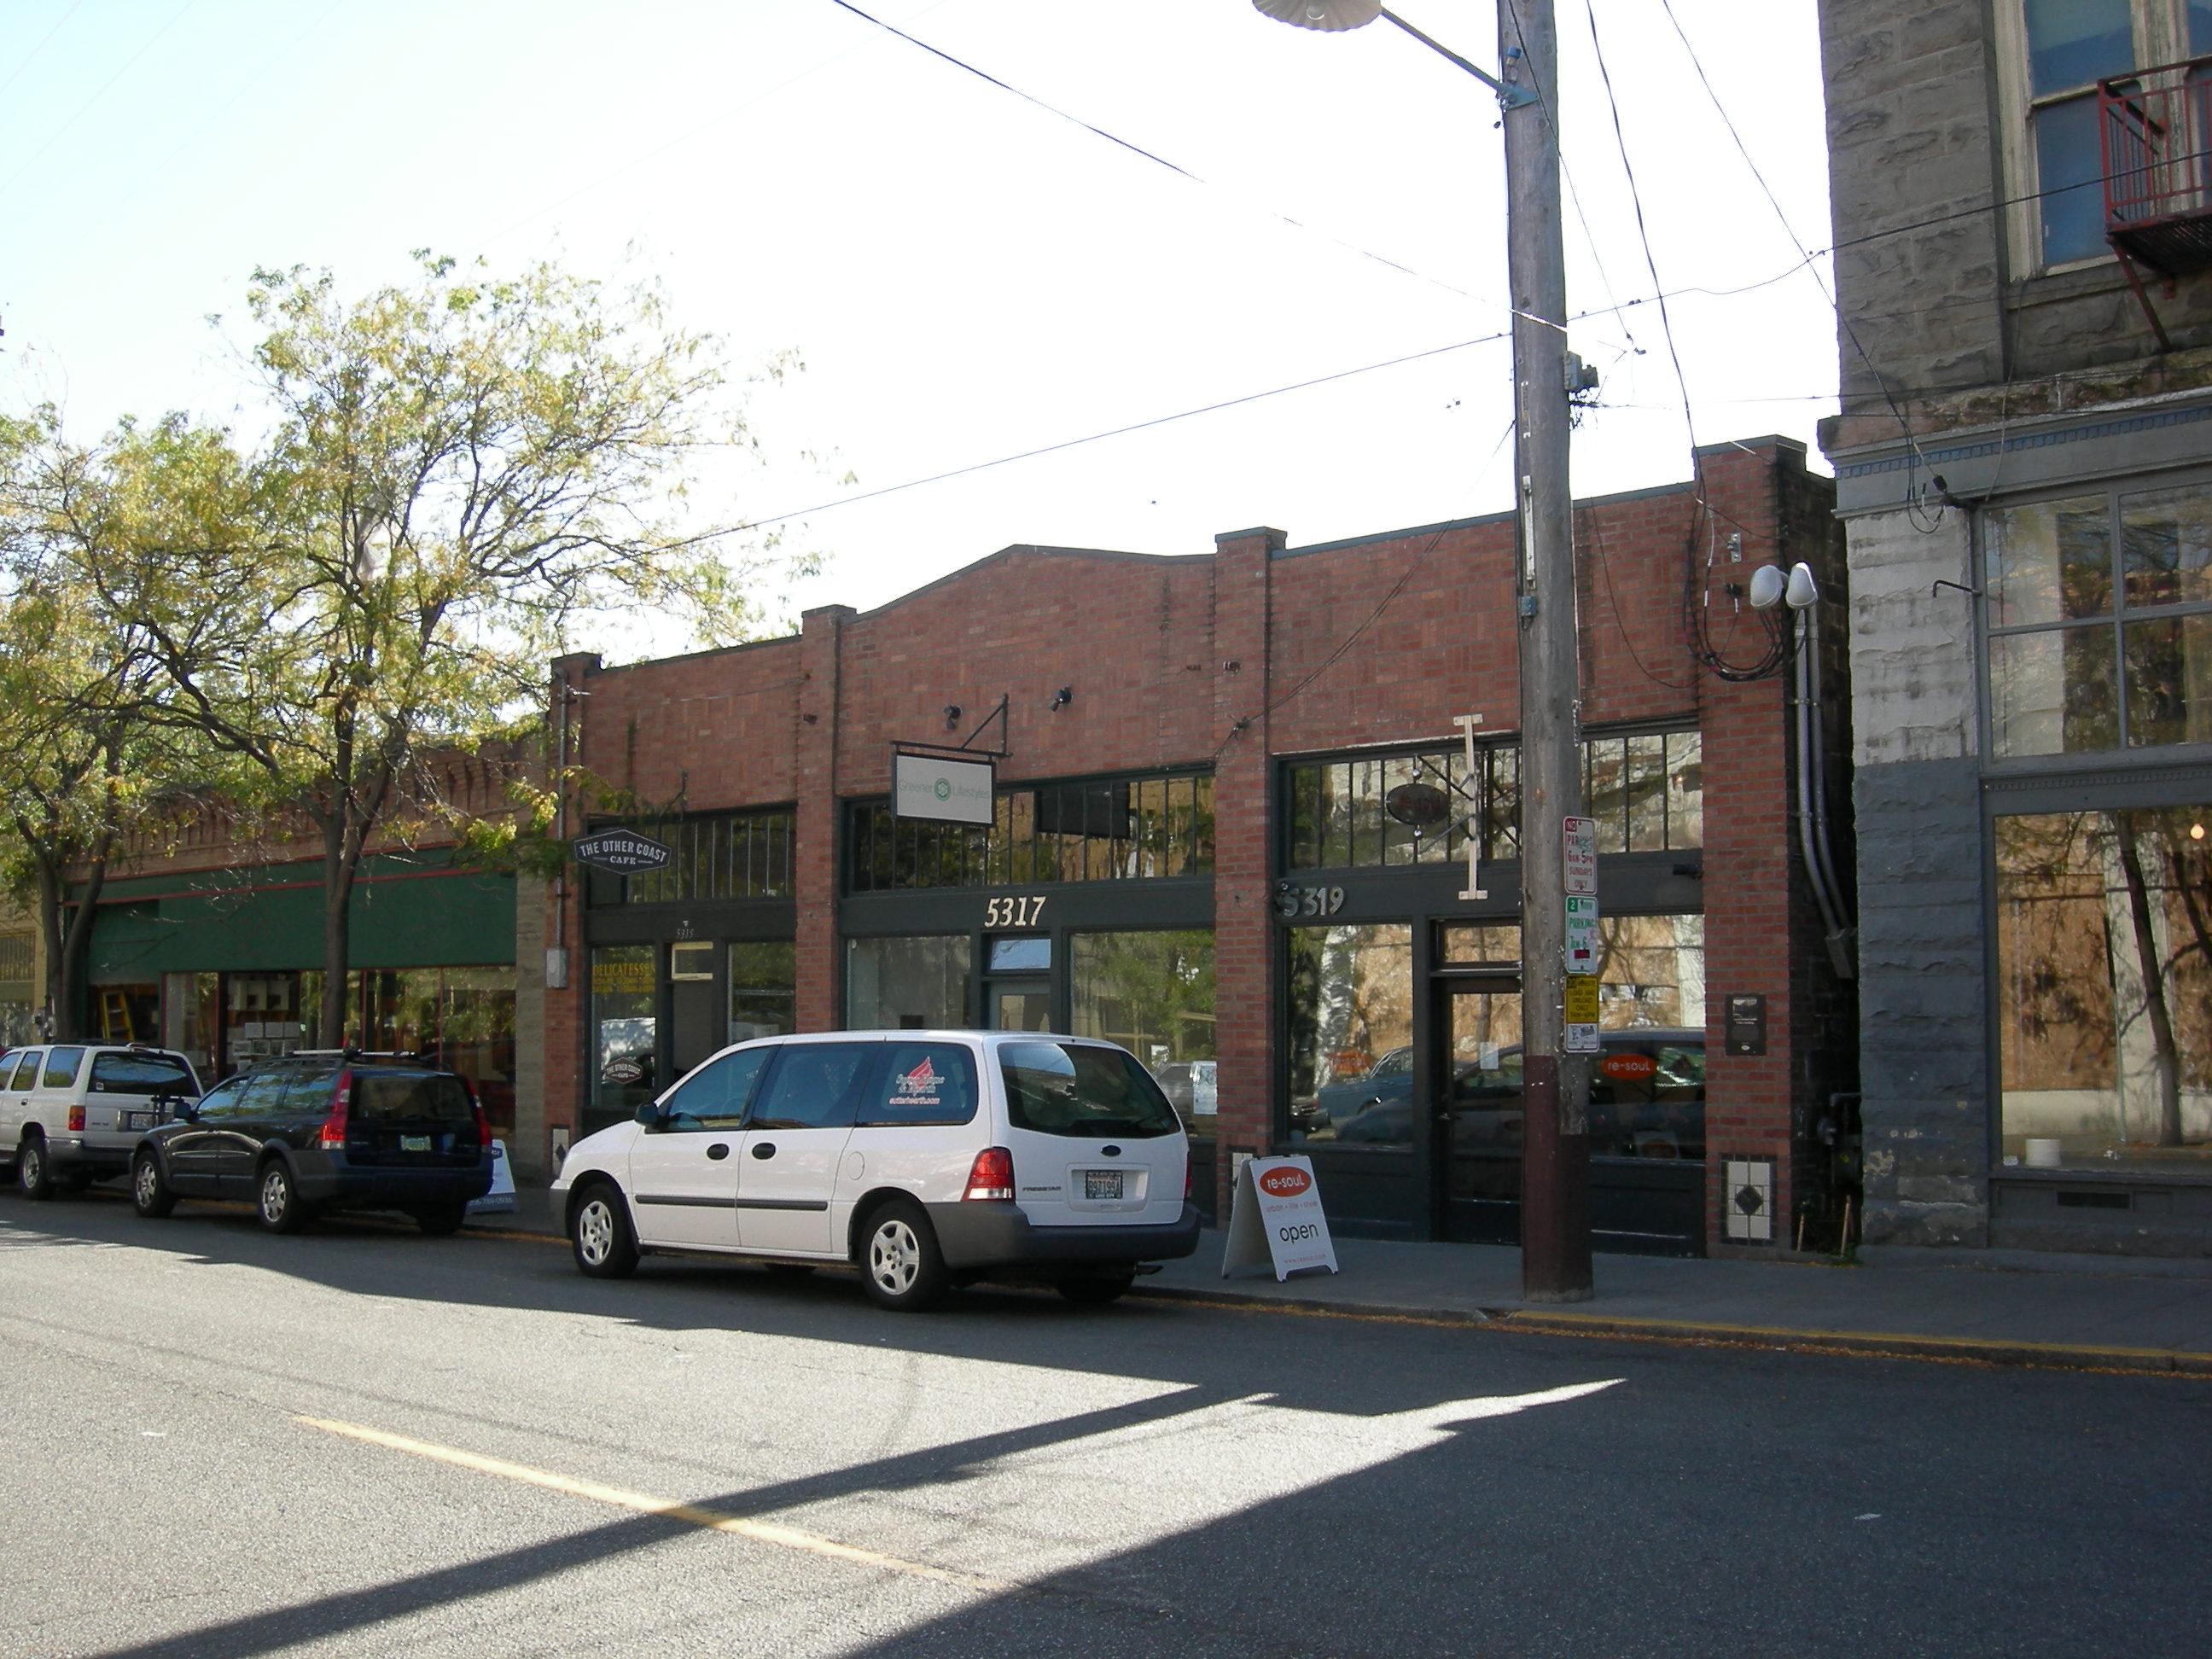 file:ballard - fisher building 01 - wikimedia commons